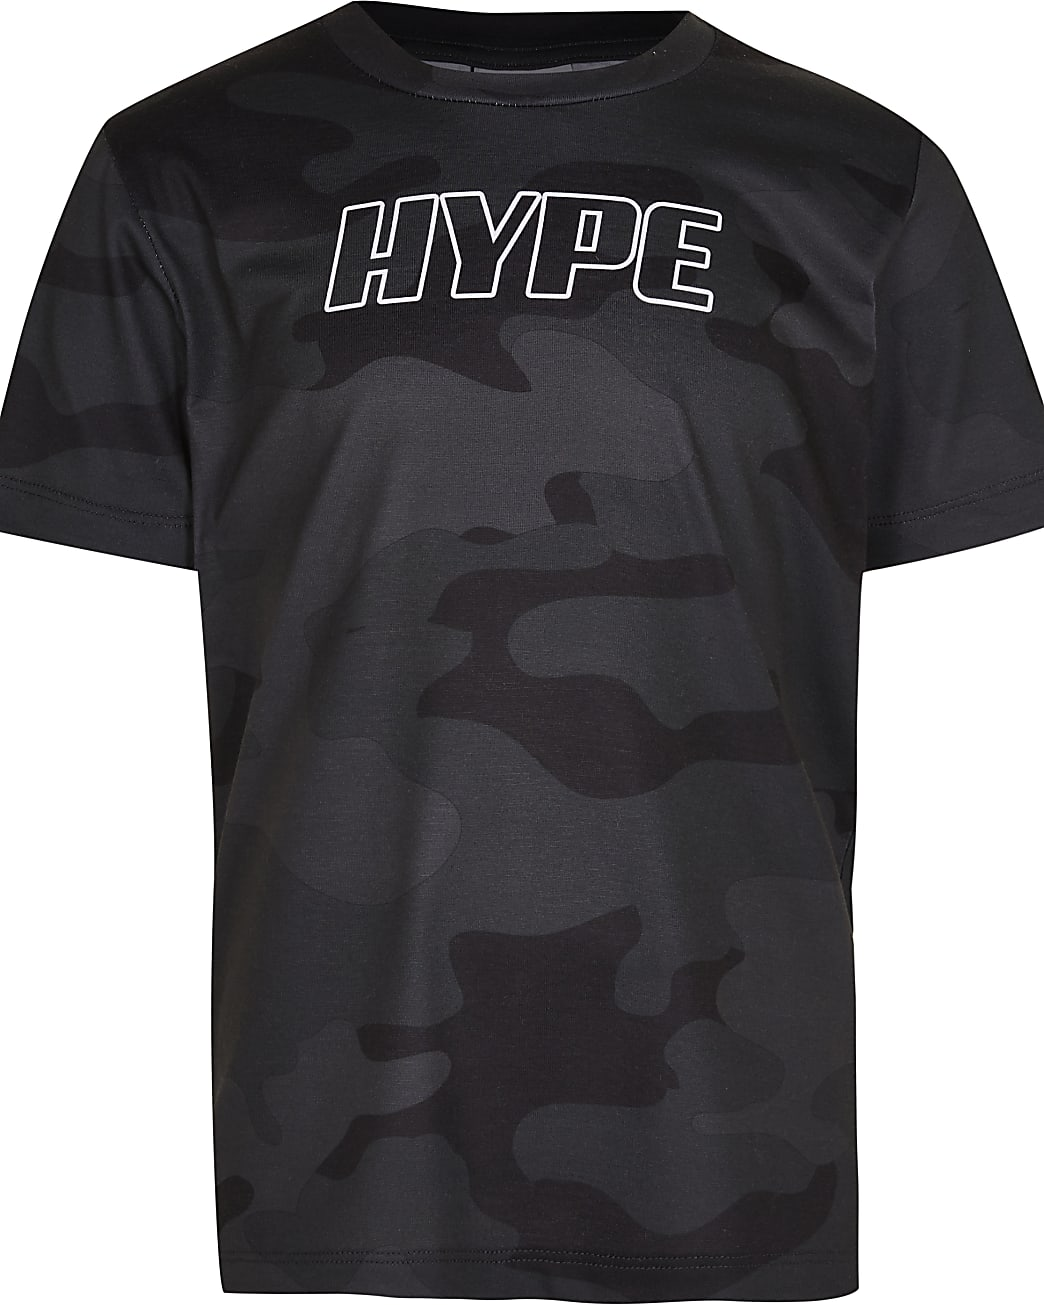 Boys black Hype camo t-shirt